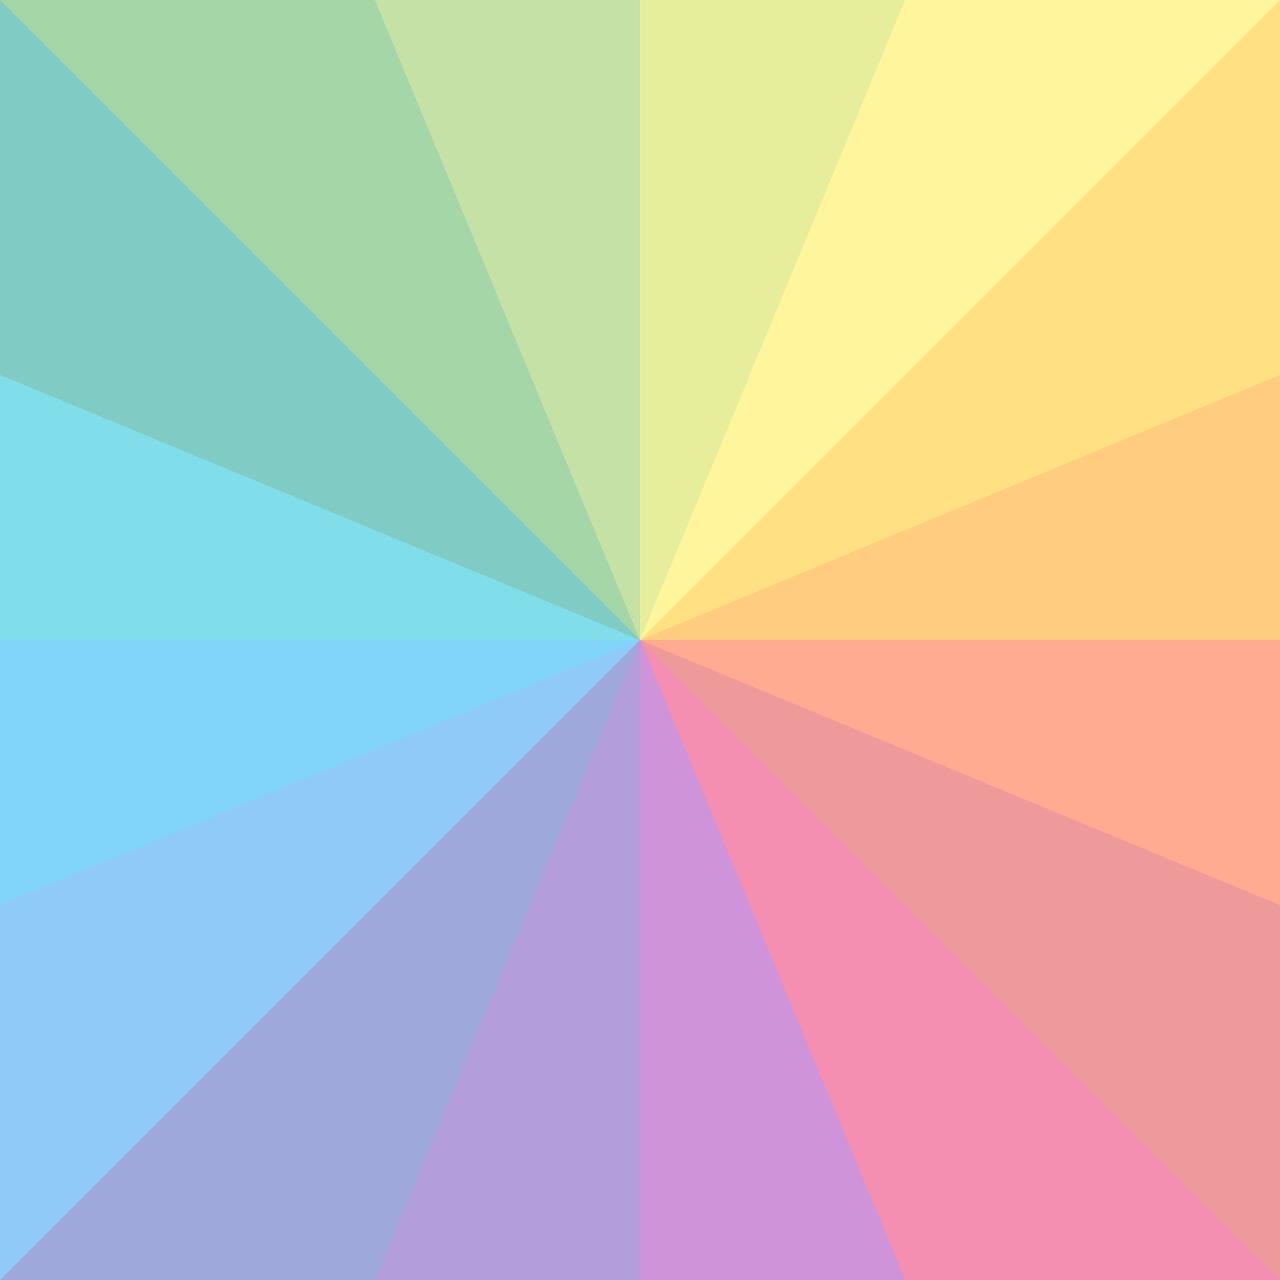 app/src/main/res/drawable-xhdpi/ic_splash_background.png